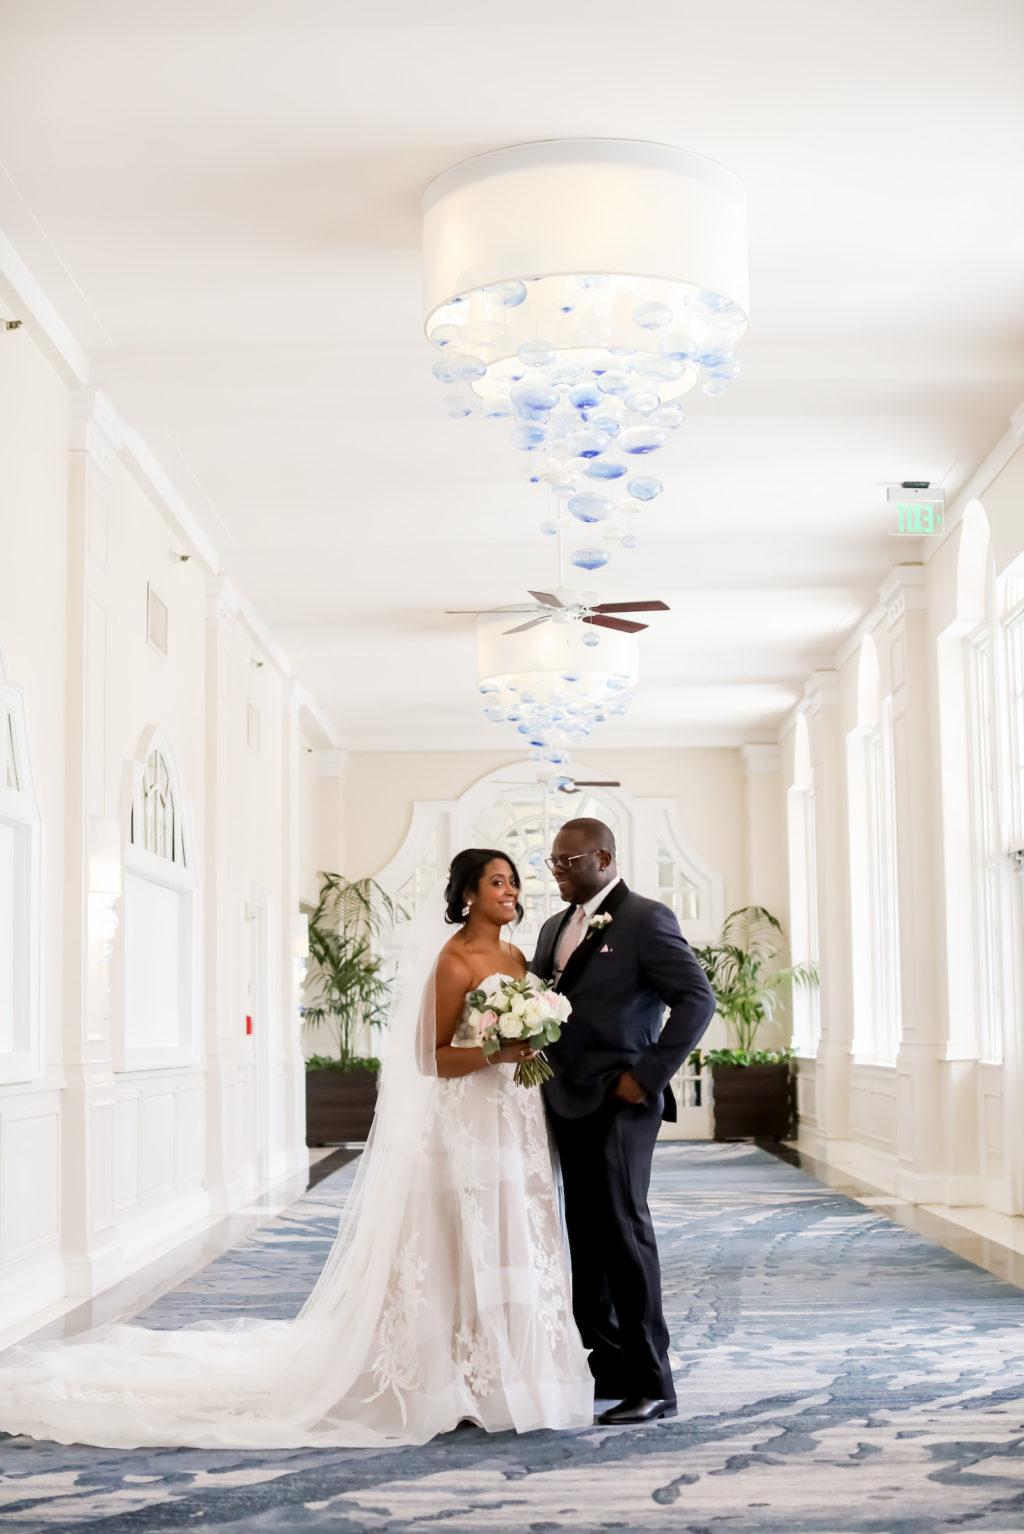 Modern St. Petersburg Bride and Groom Wedding Portraits Inside Wedding Venue The Pink Palace The Don CeSar   Florida Wedding Photographer Lifelong Photography Studio